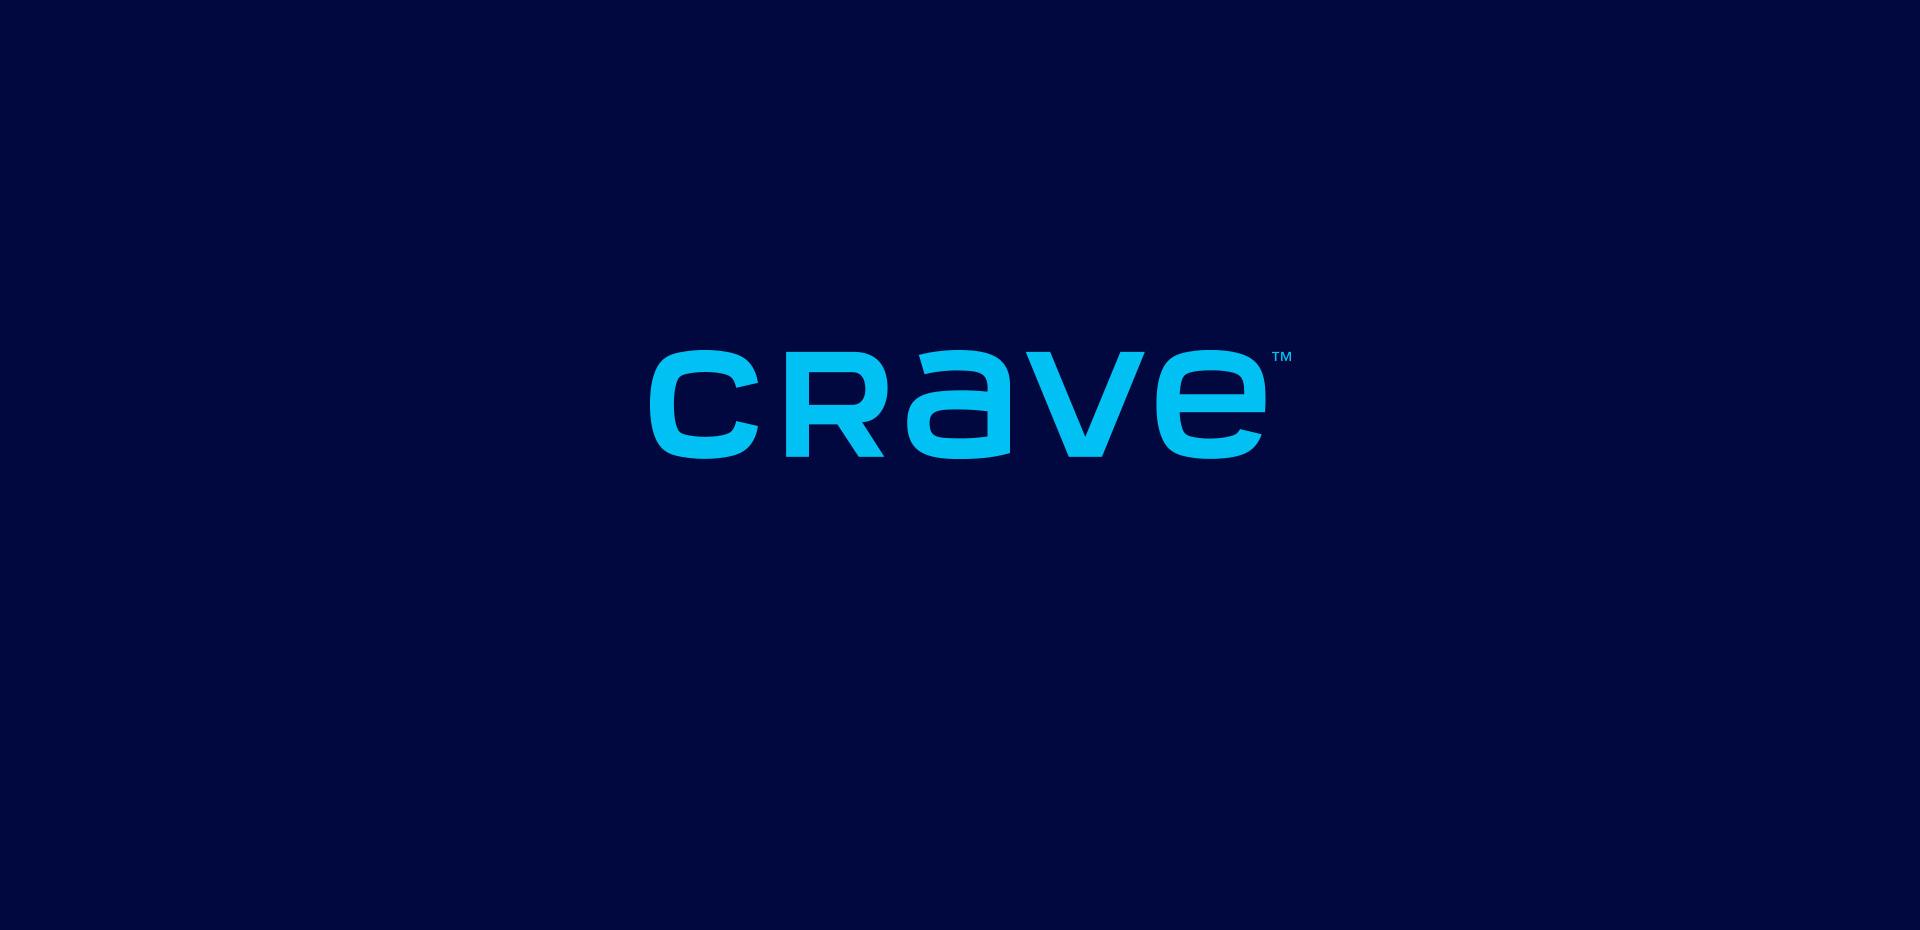 Start Your Engines Hennys! Casting Details for CRAVE'S DRAG